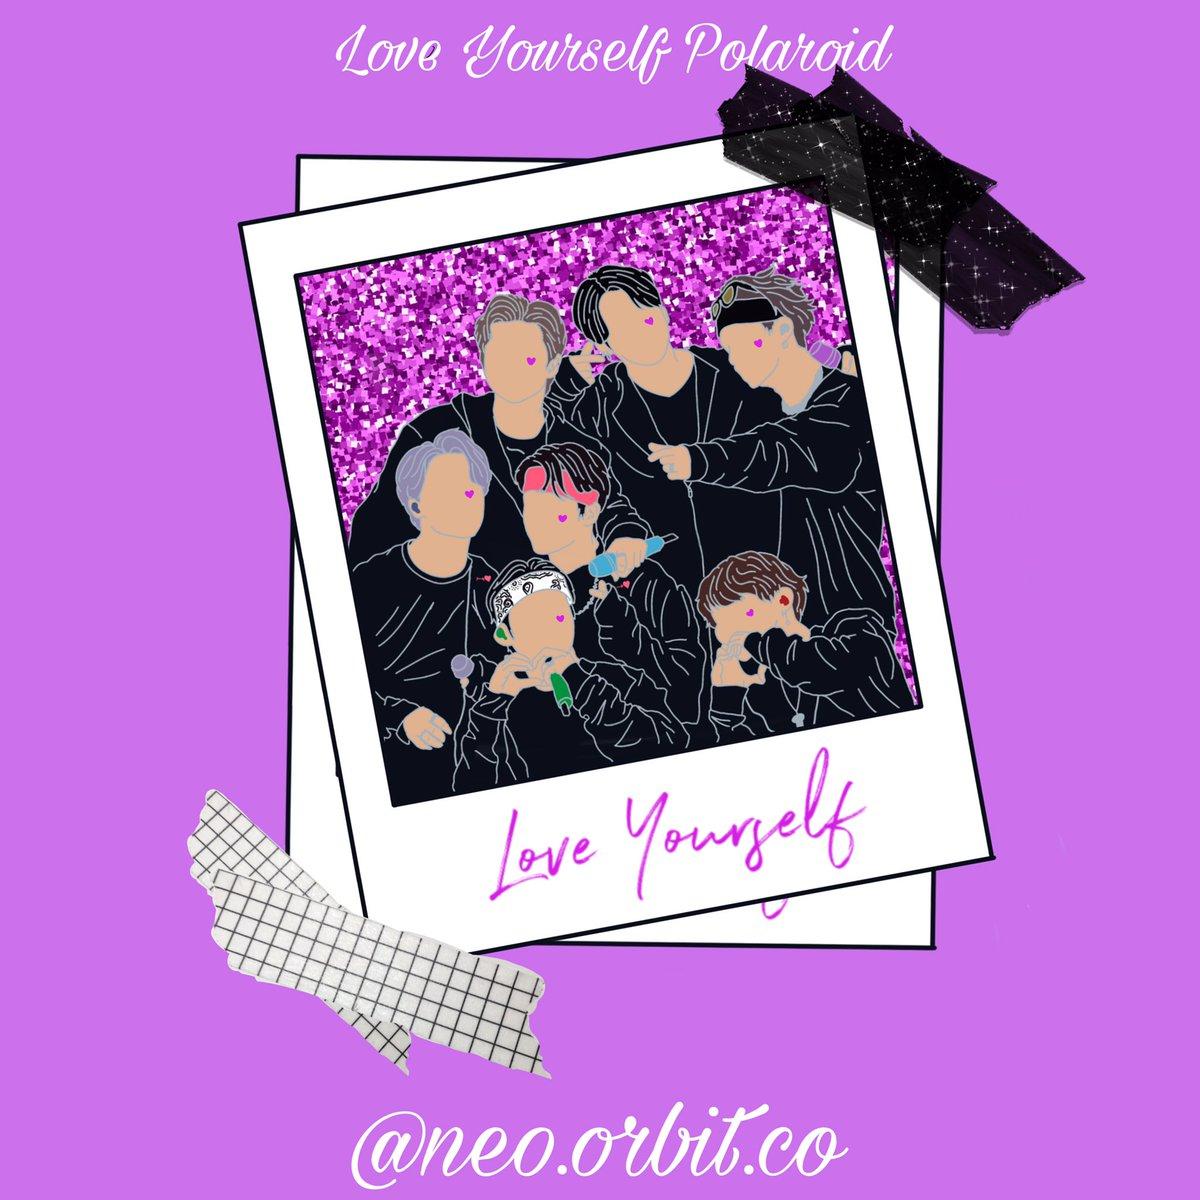 Design Drop  Love Yourself Polaroid Pin  #loveyourselffirst #loveyourself #bts #BTSLoveMyself #enamelpin #KimTaehyung #KimNamjoon #JeonJungkook #MinYoongi #KIMSEOKJIN #JungHoseok #parkjimin https://t.co/W6izWg039H